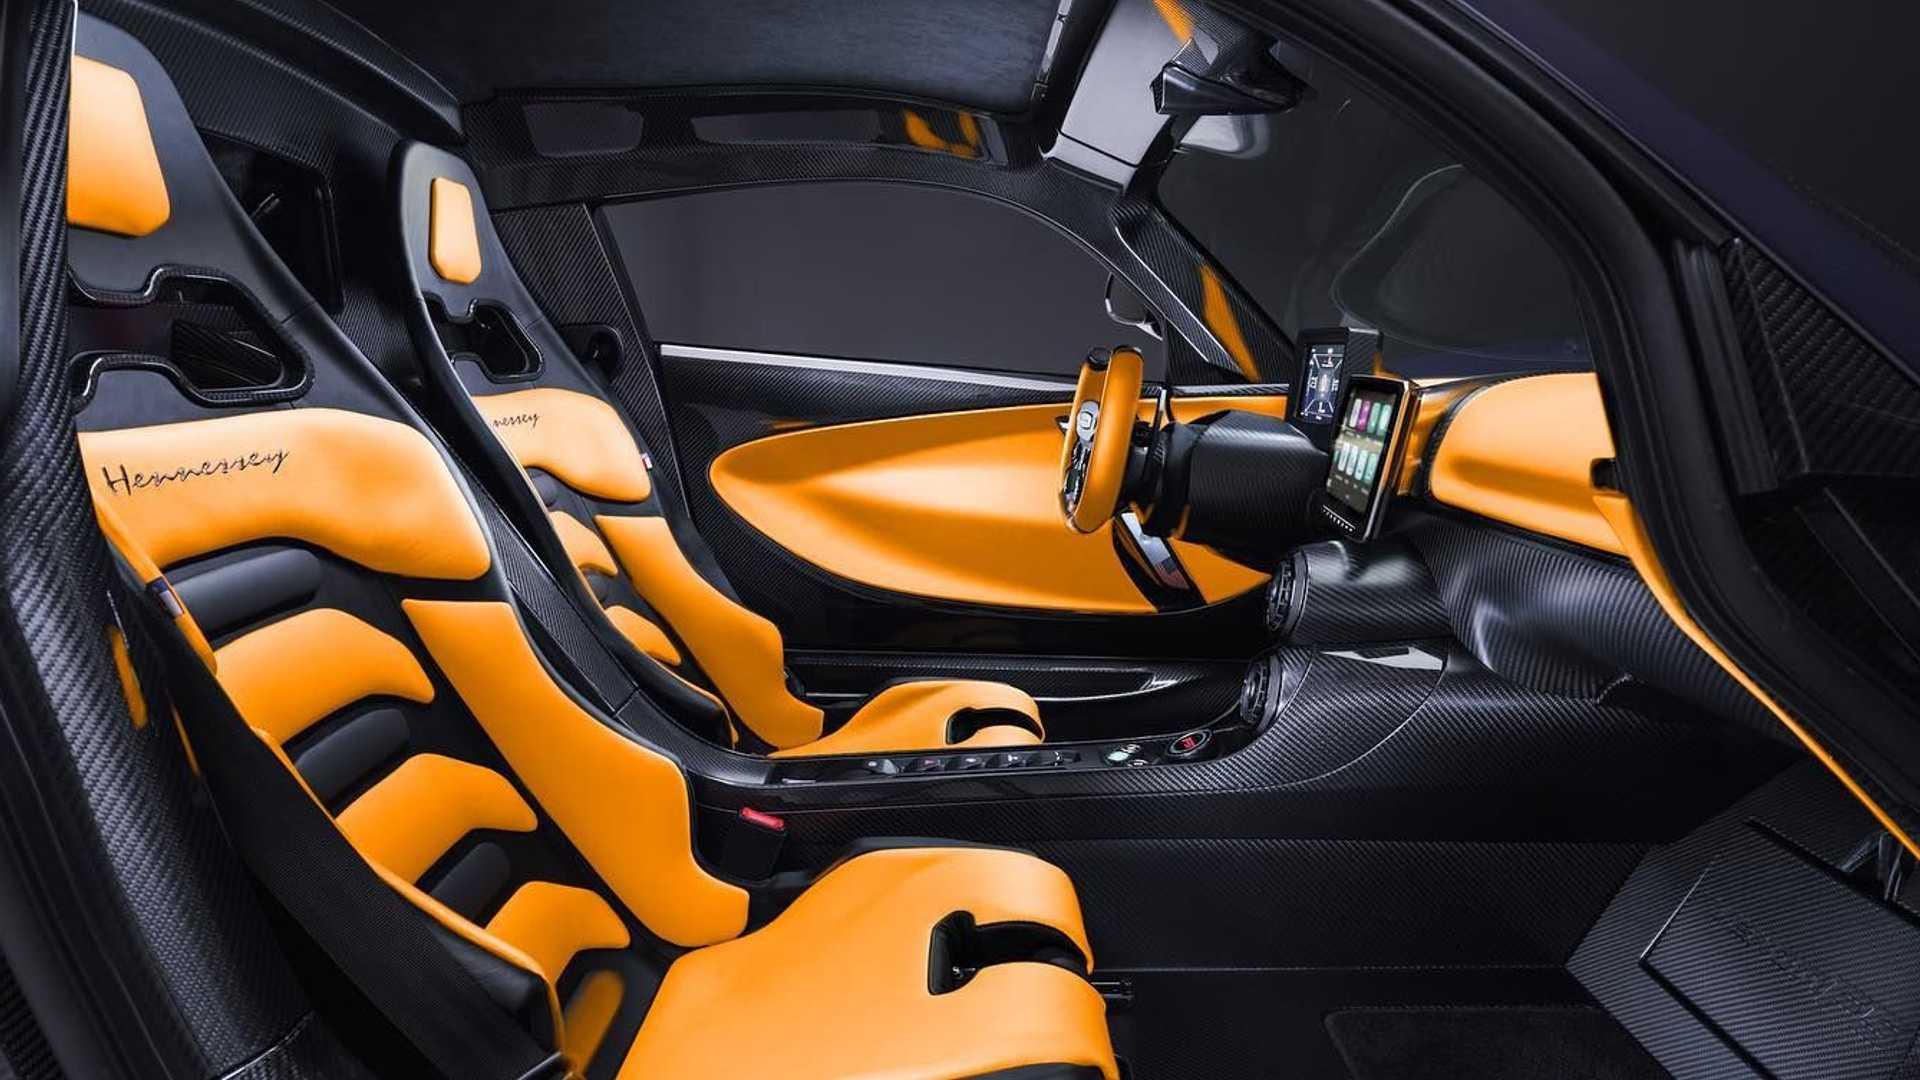 El interior del Hennessey Venom F5 es espectacular